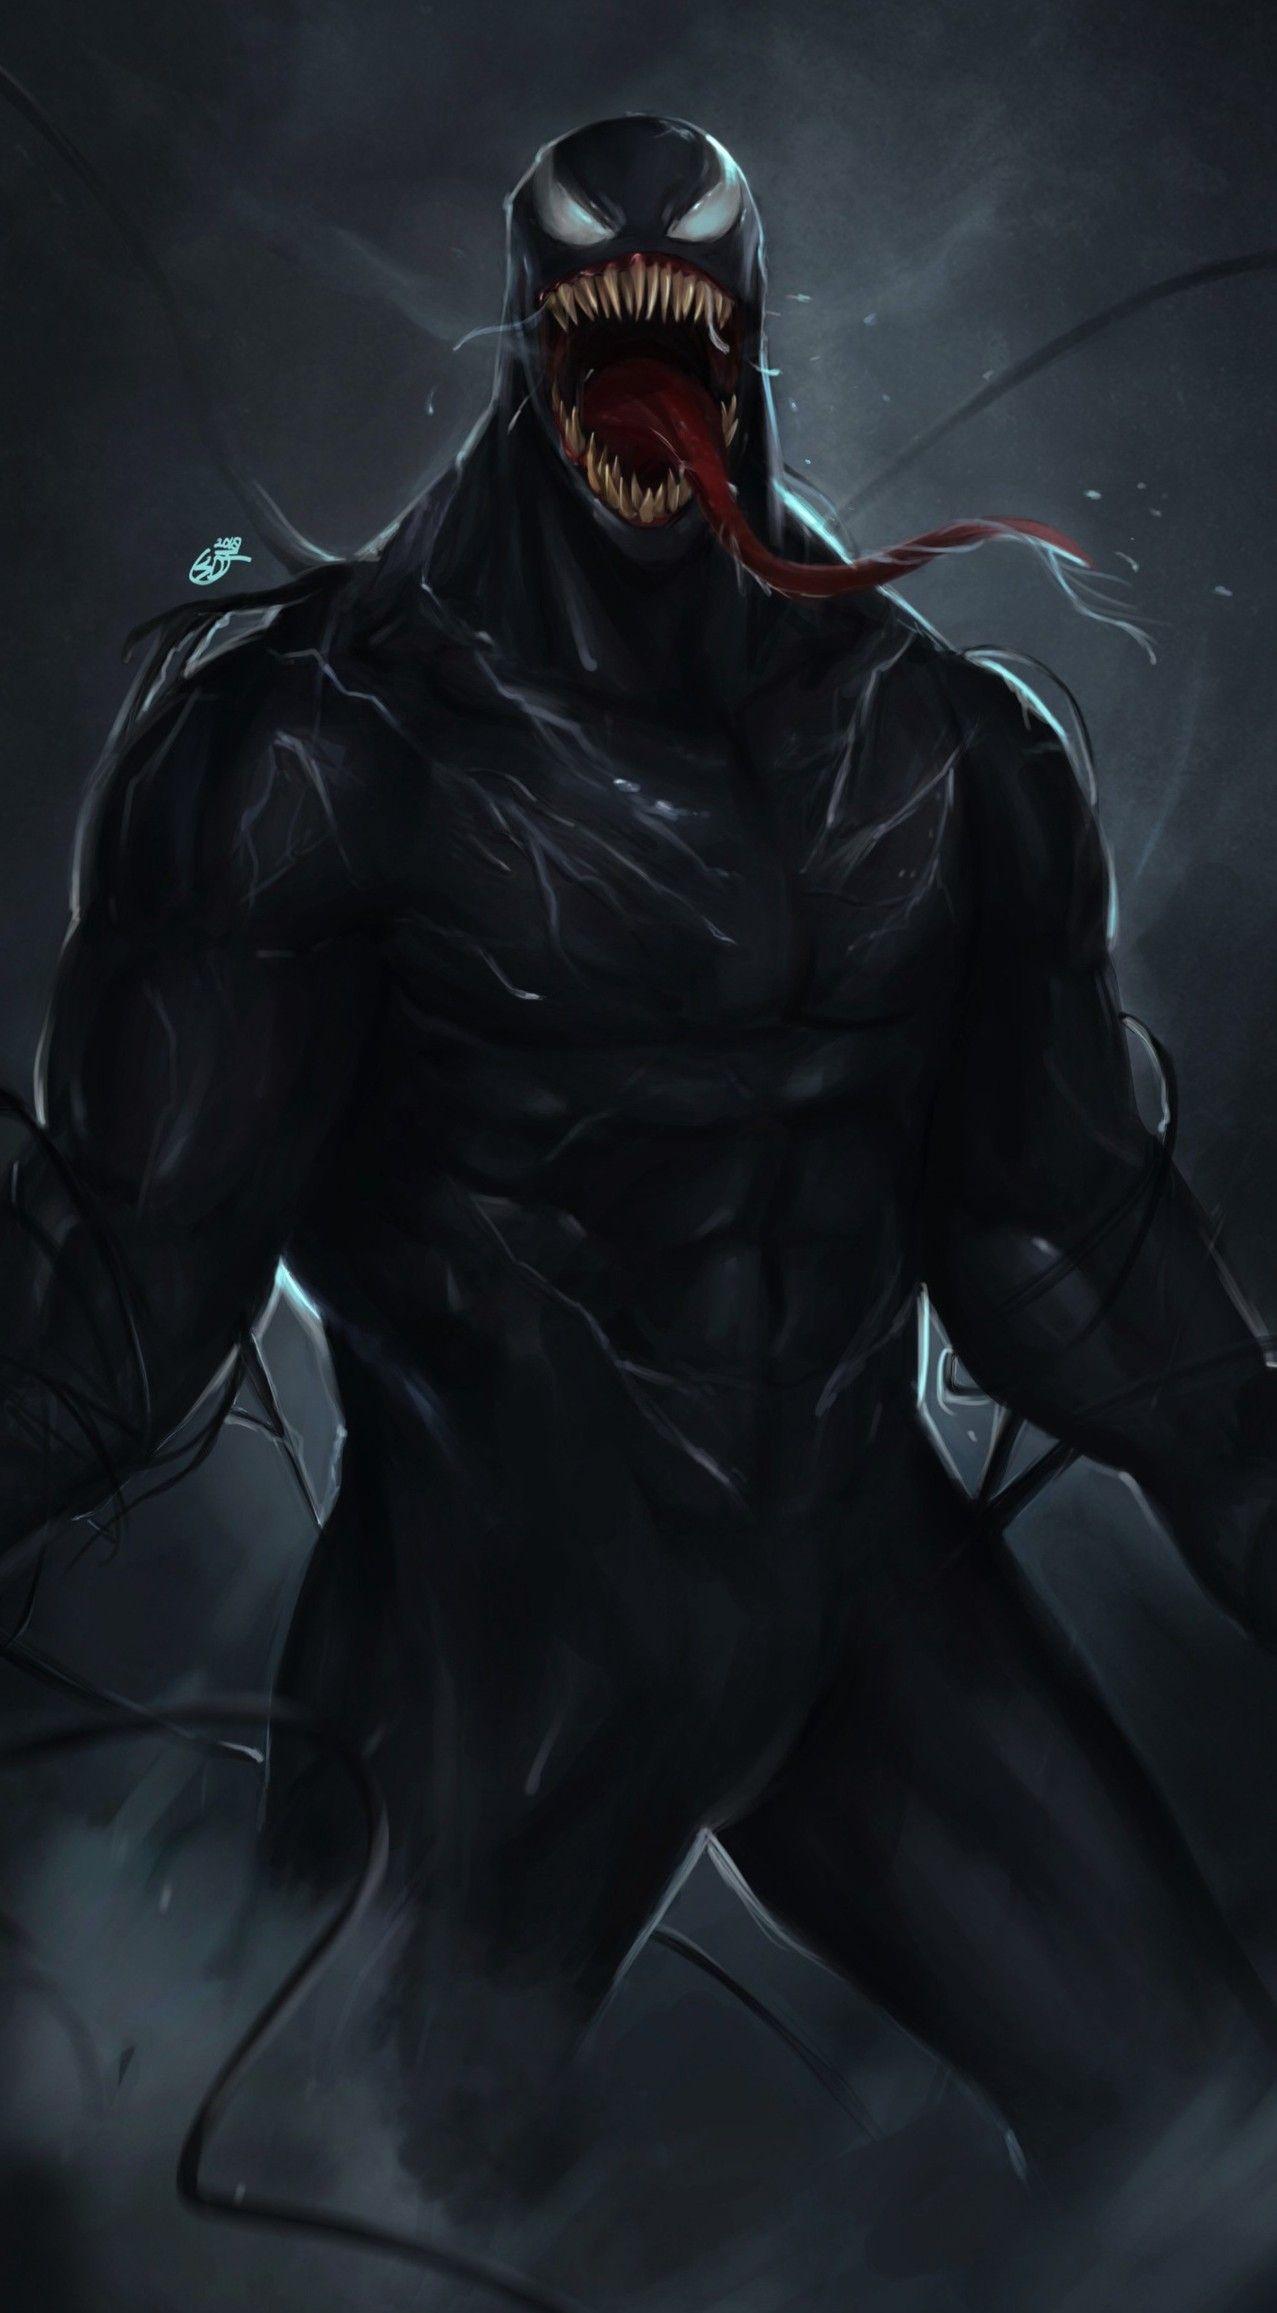 Pin by Noe Ramirez on Venom | Venom comics, Venom, Venom 2018